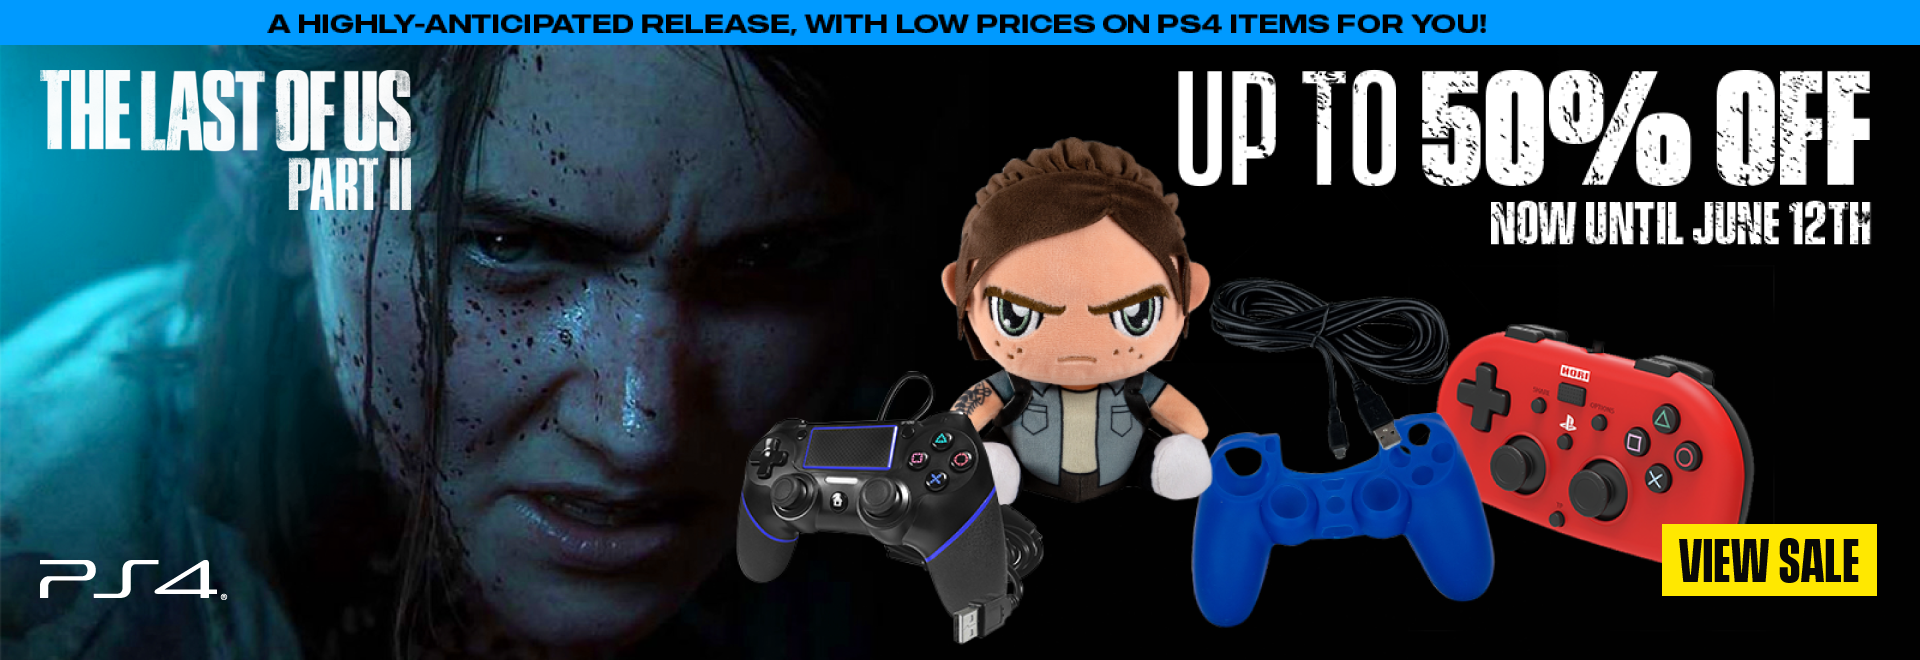 The Last of Us 2 - Sale